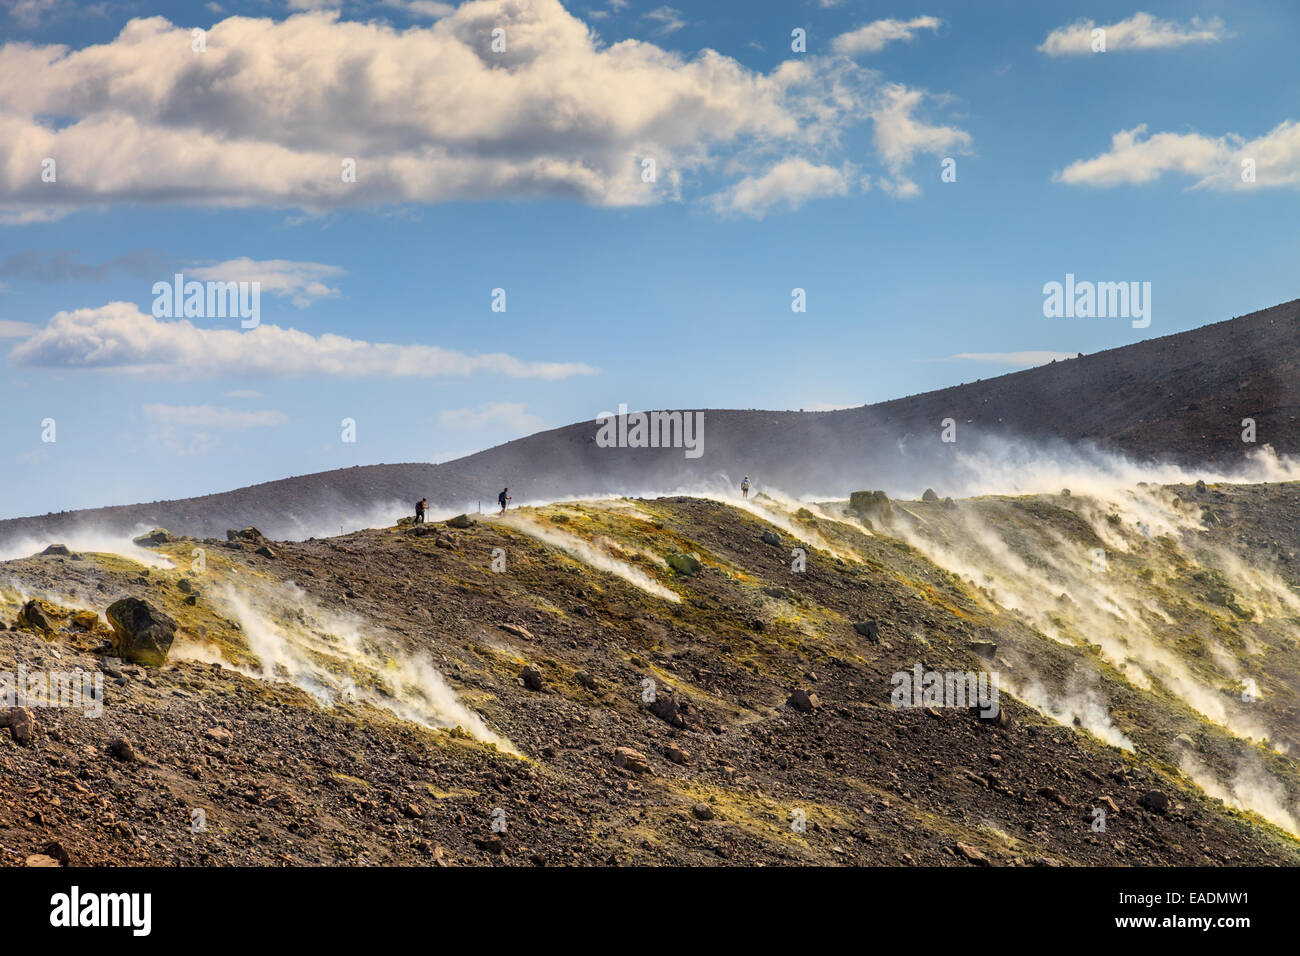 The active volcano in Vulcano Island - Stock Image